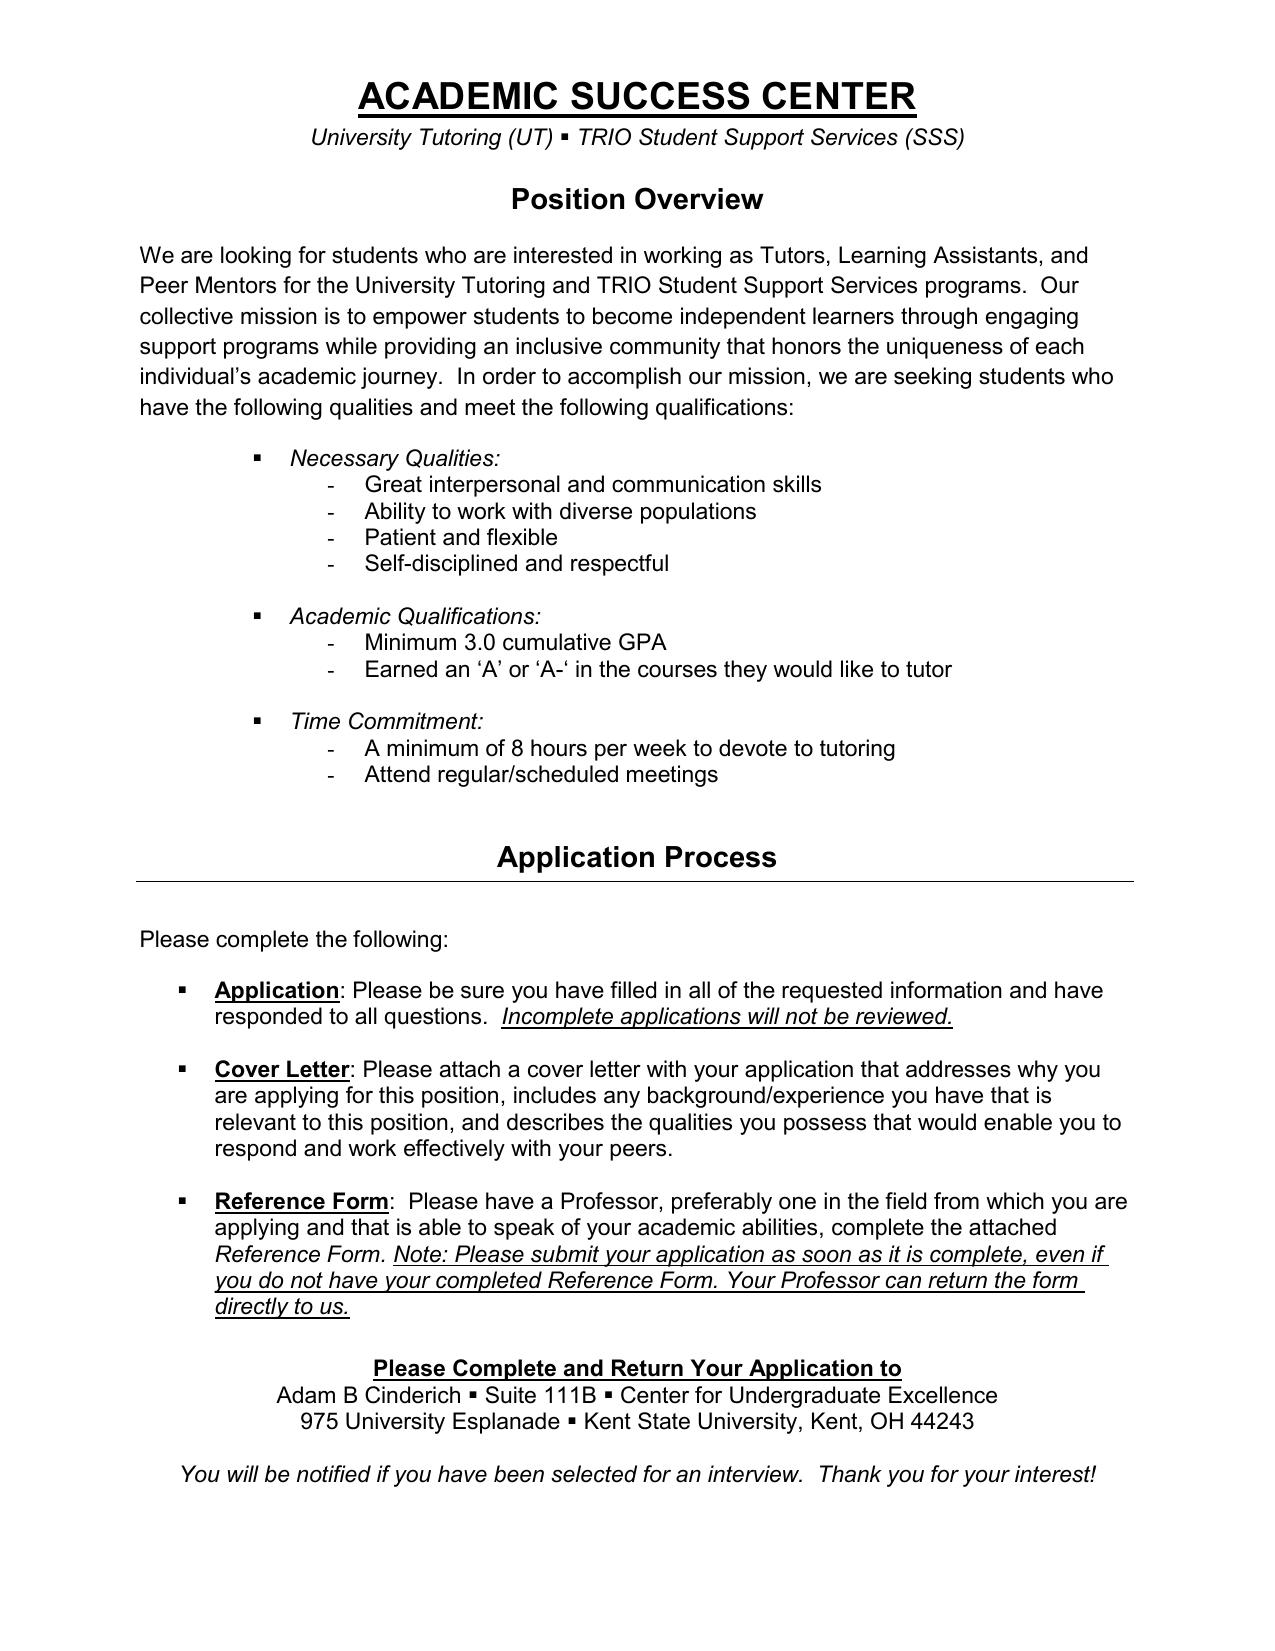 ACADEMIC SUCCESS CENTER Position Overview